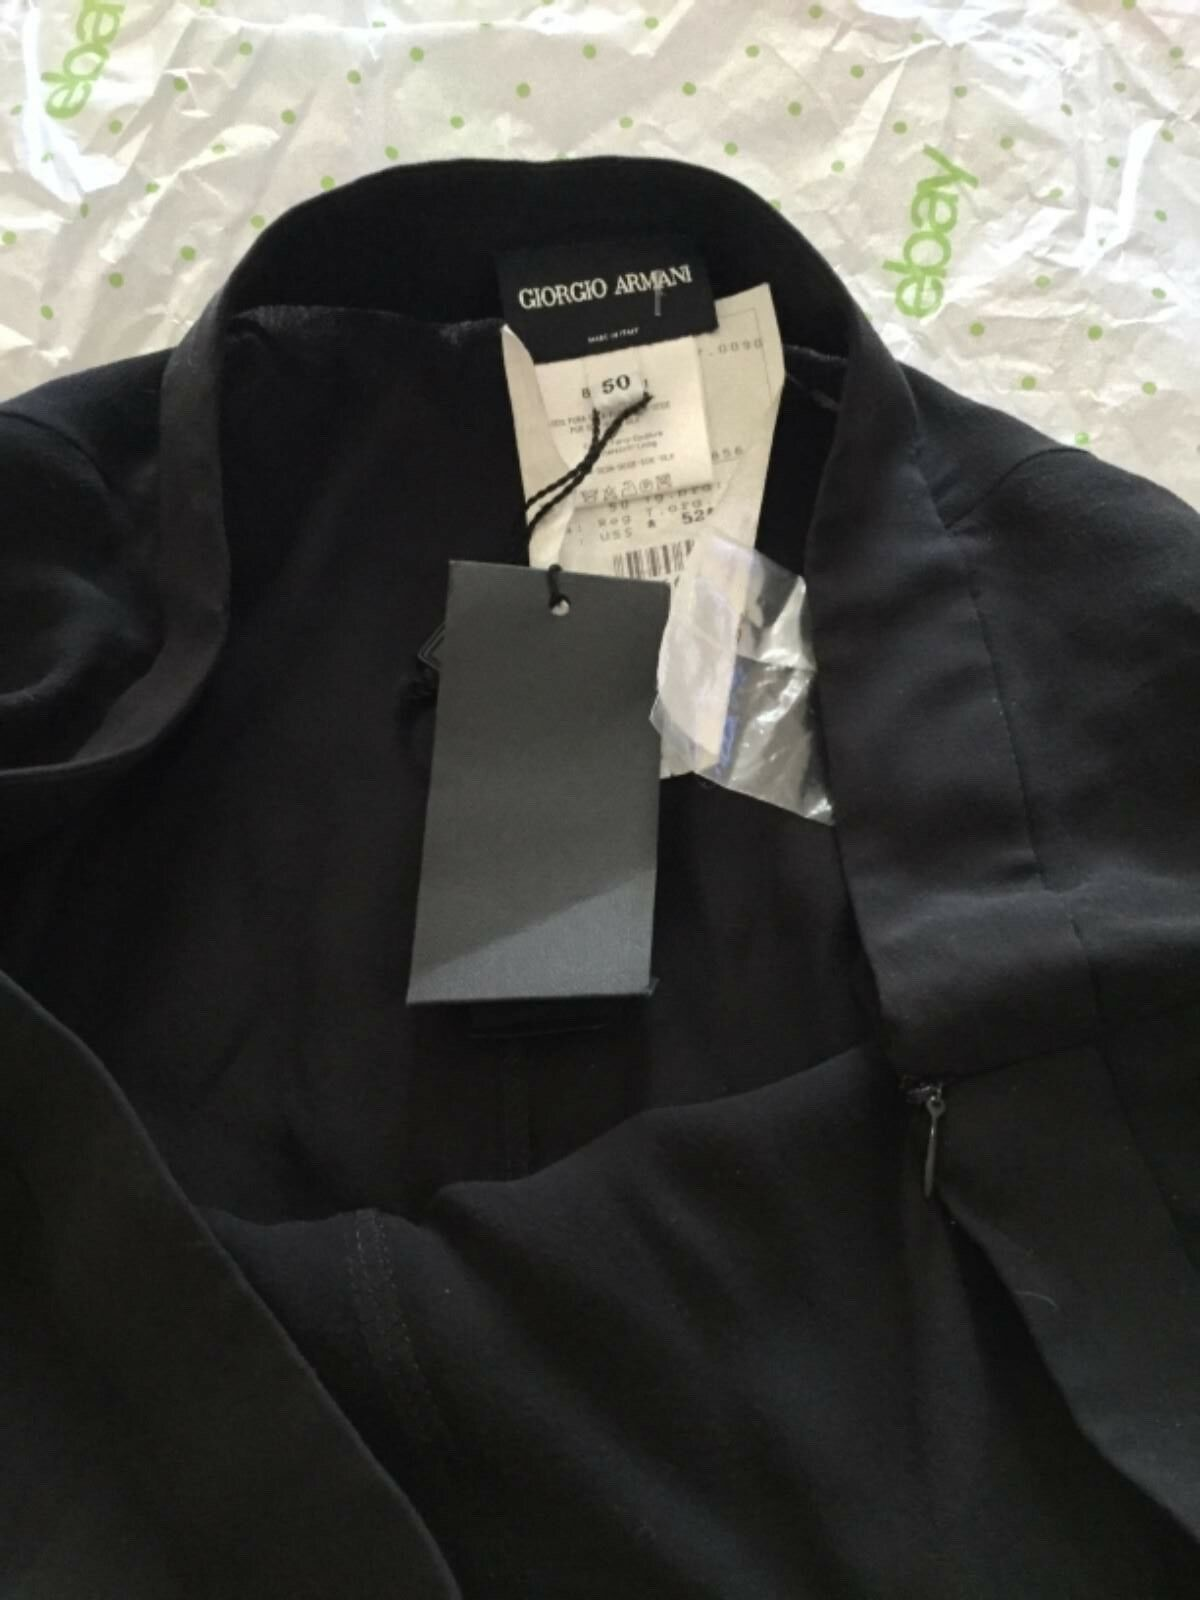 NEW Giorgio Armani Women's 100% Silk 2-Ply Skirt - 50